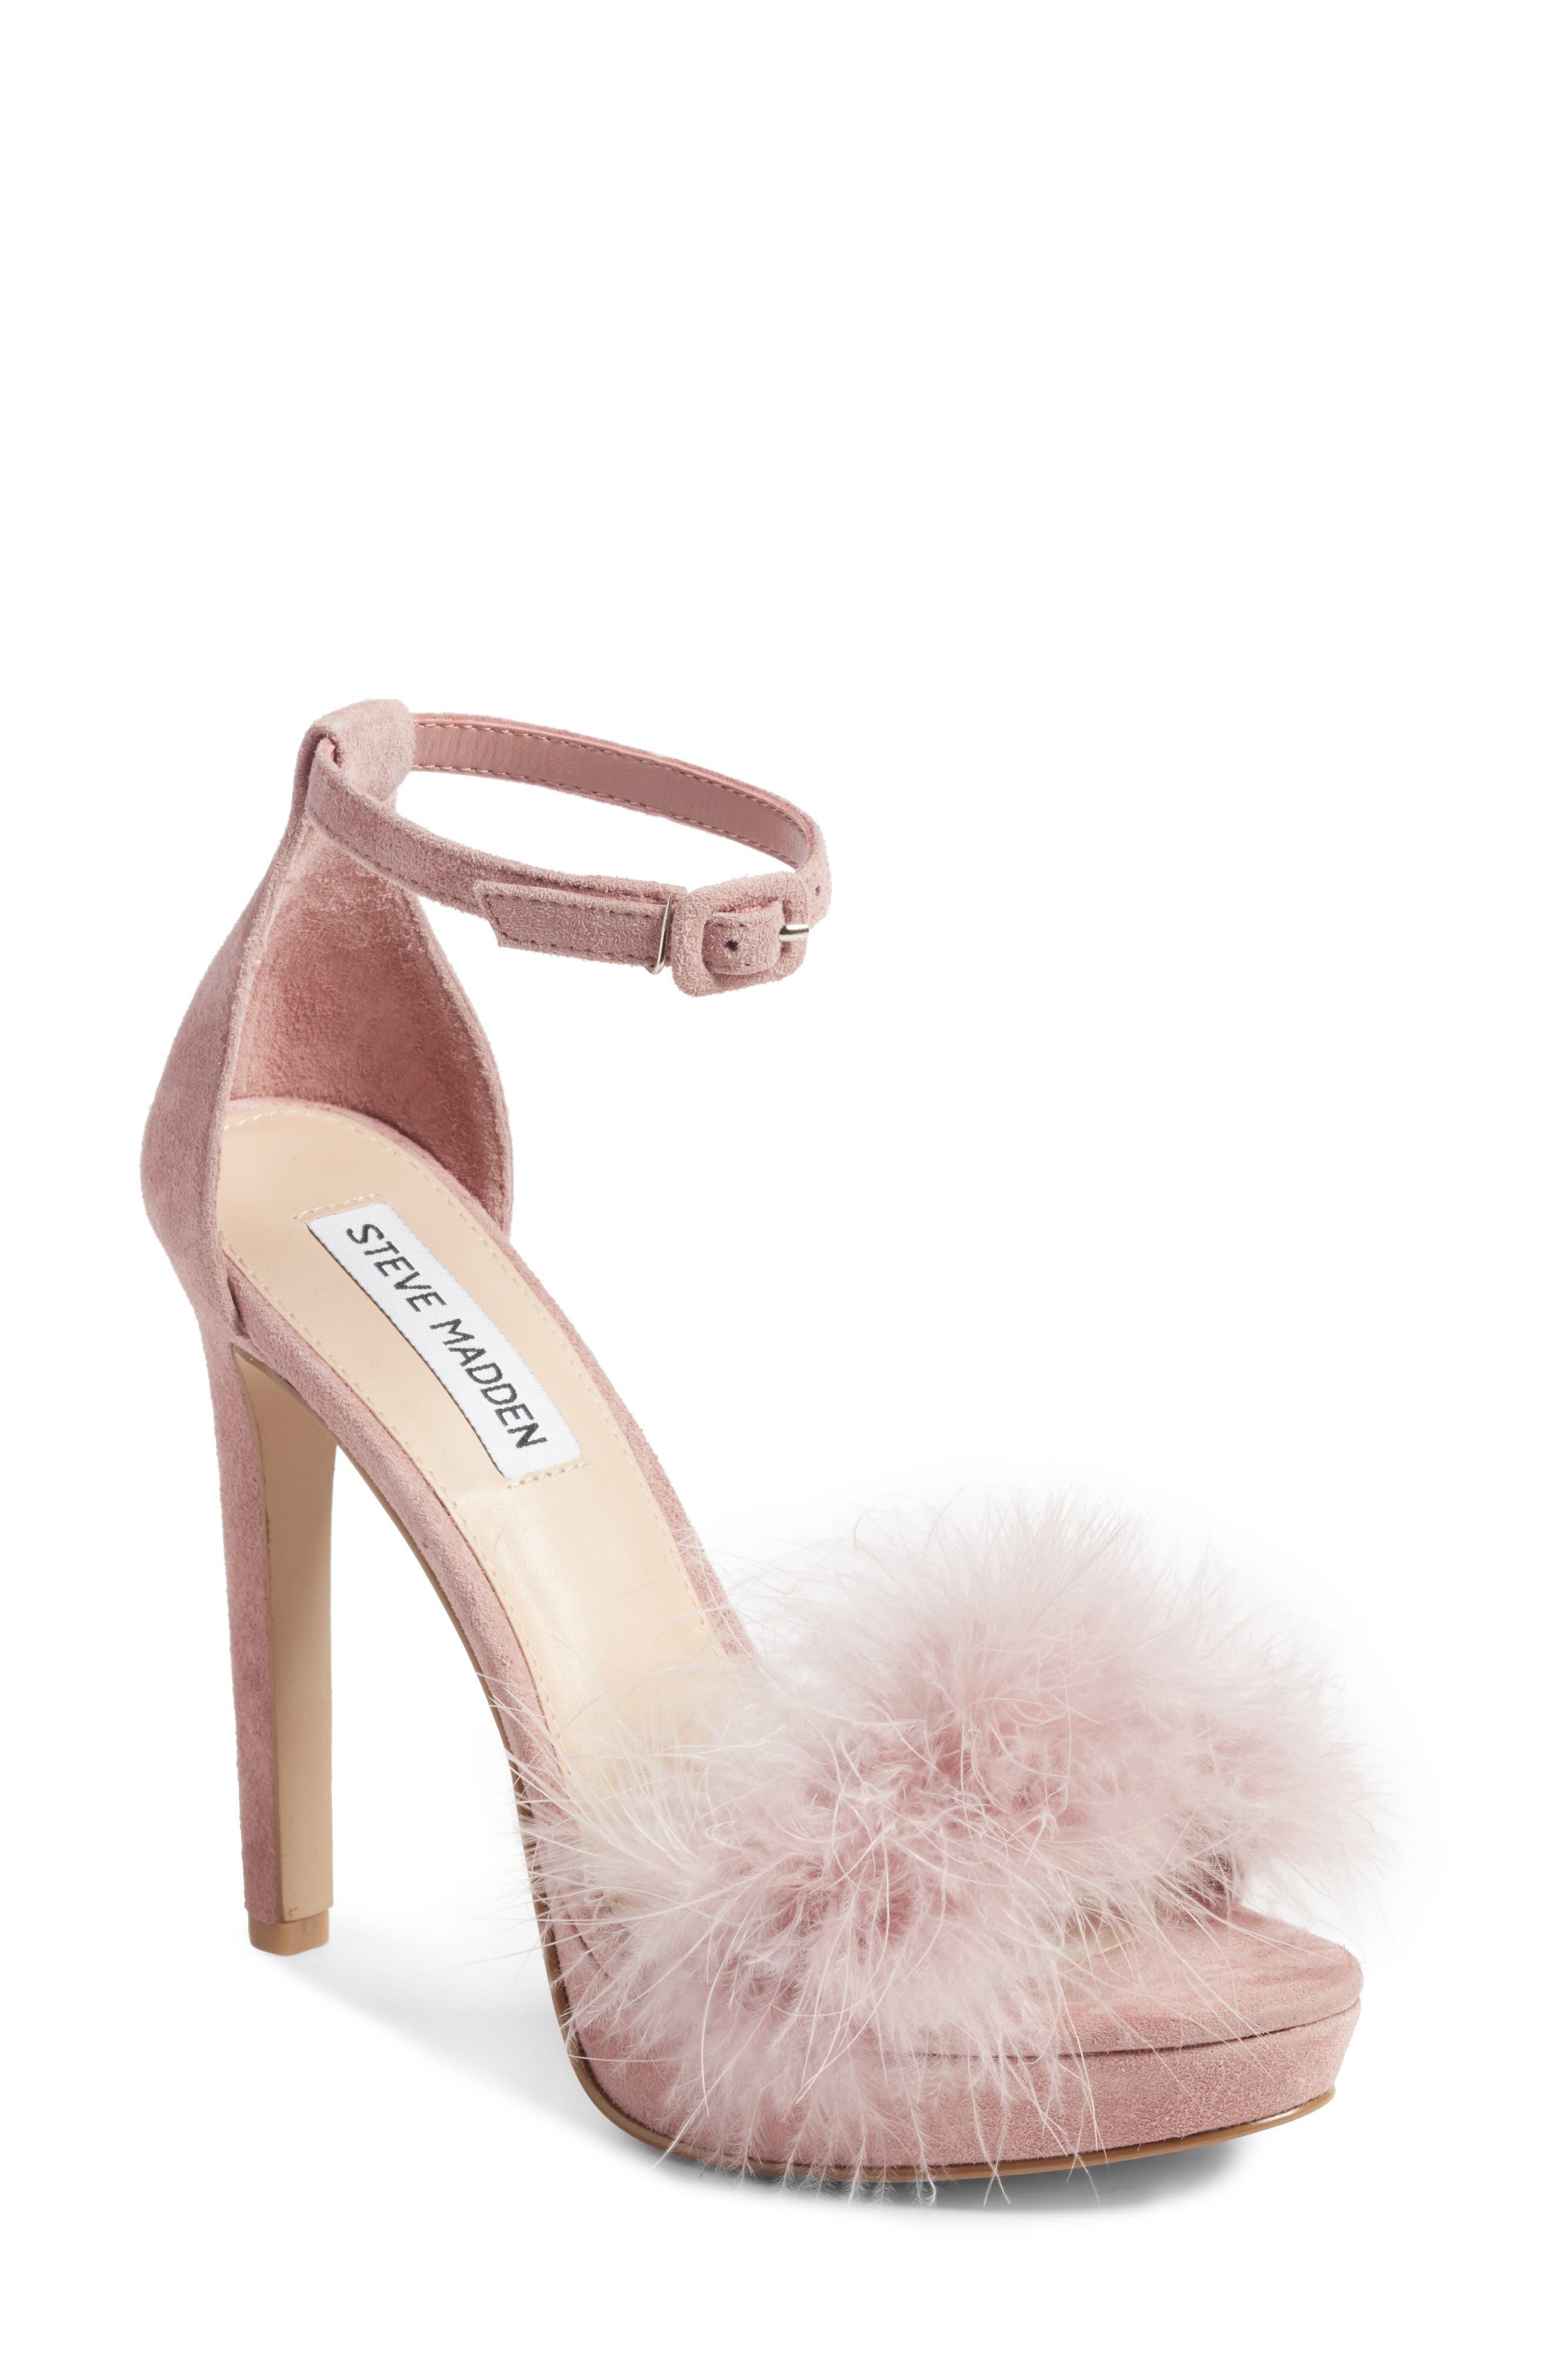 Alternate Image 1 Selected - Steve Madden Clutch Ankle Strap Sandal (Women)